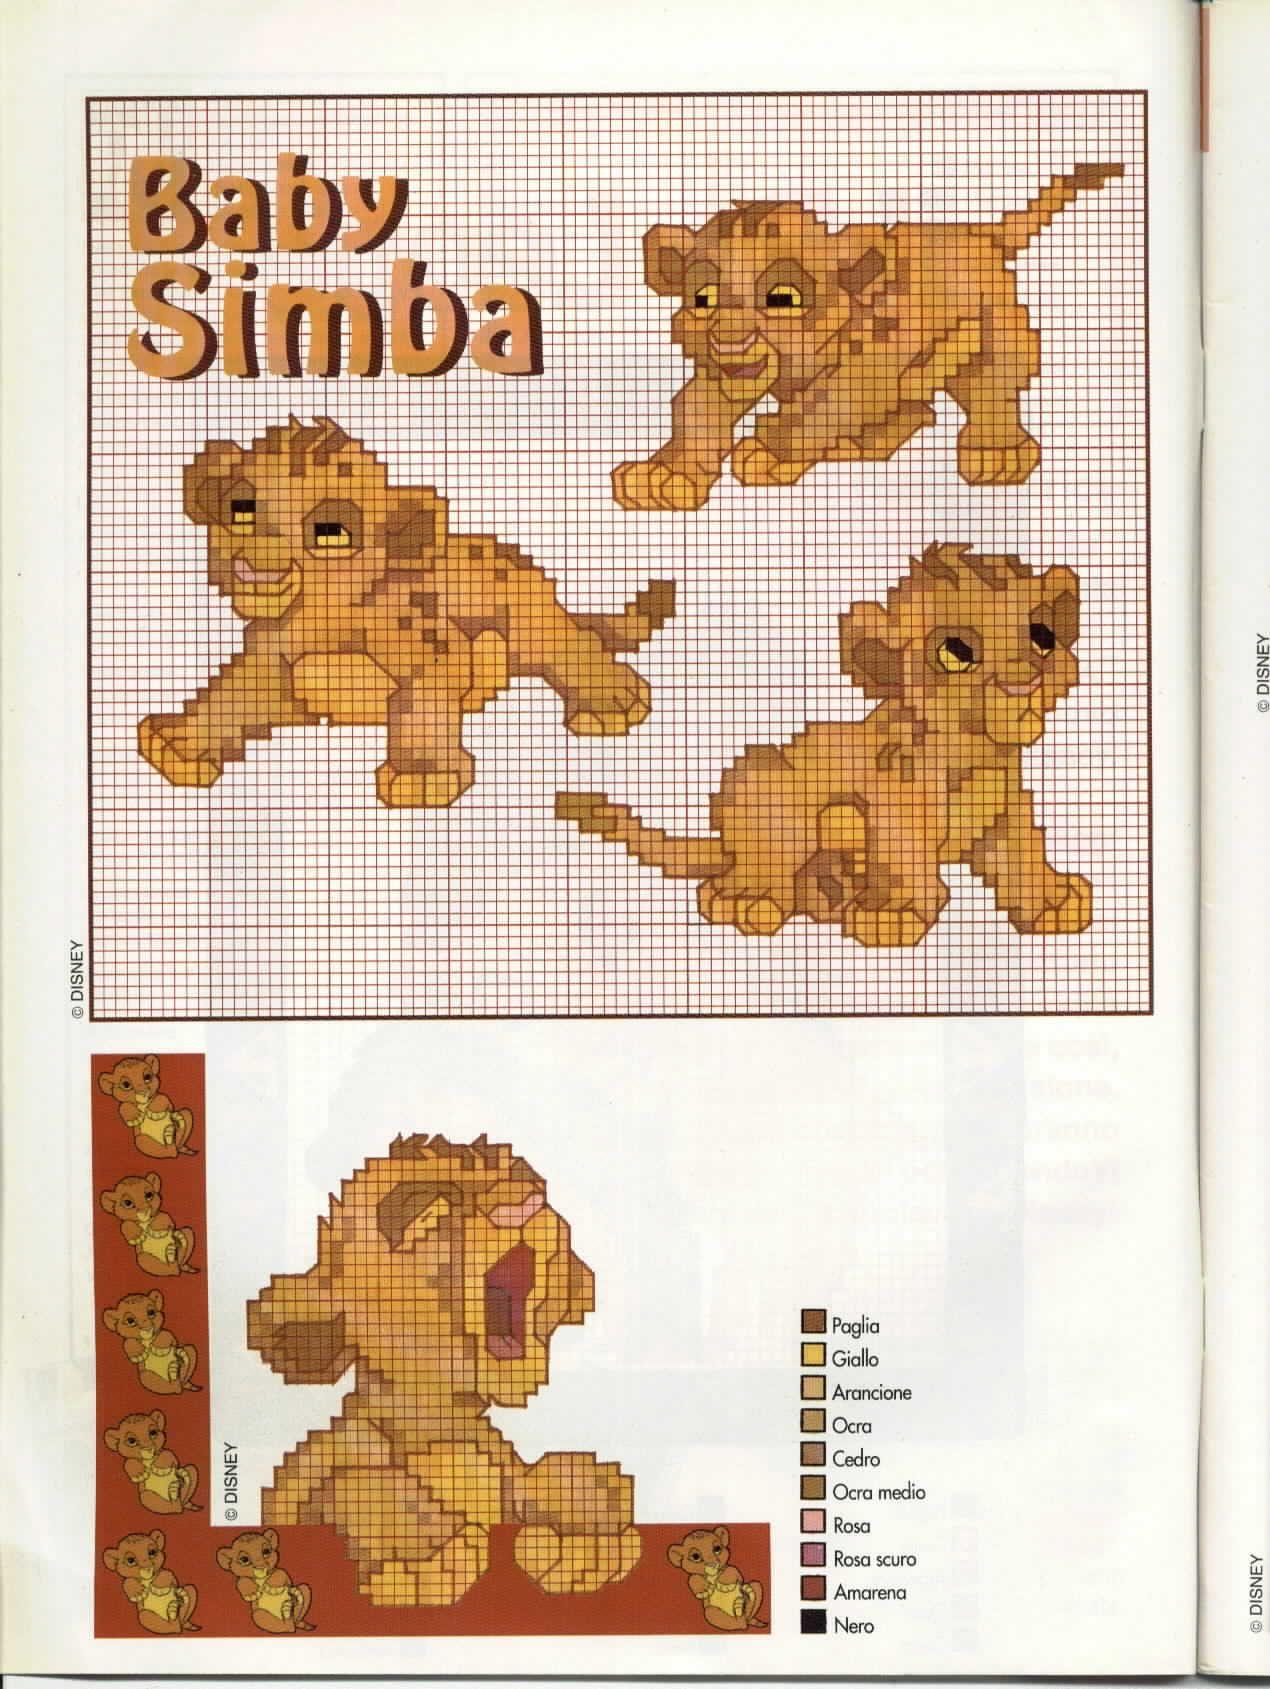 Baby Simba de il re leone | bordar | Pinterest | Zeichentrickfiguren ...